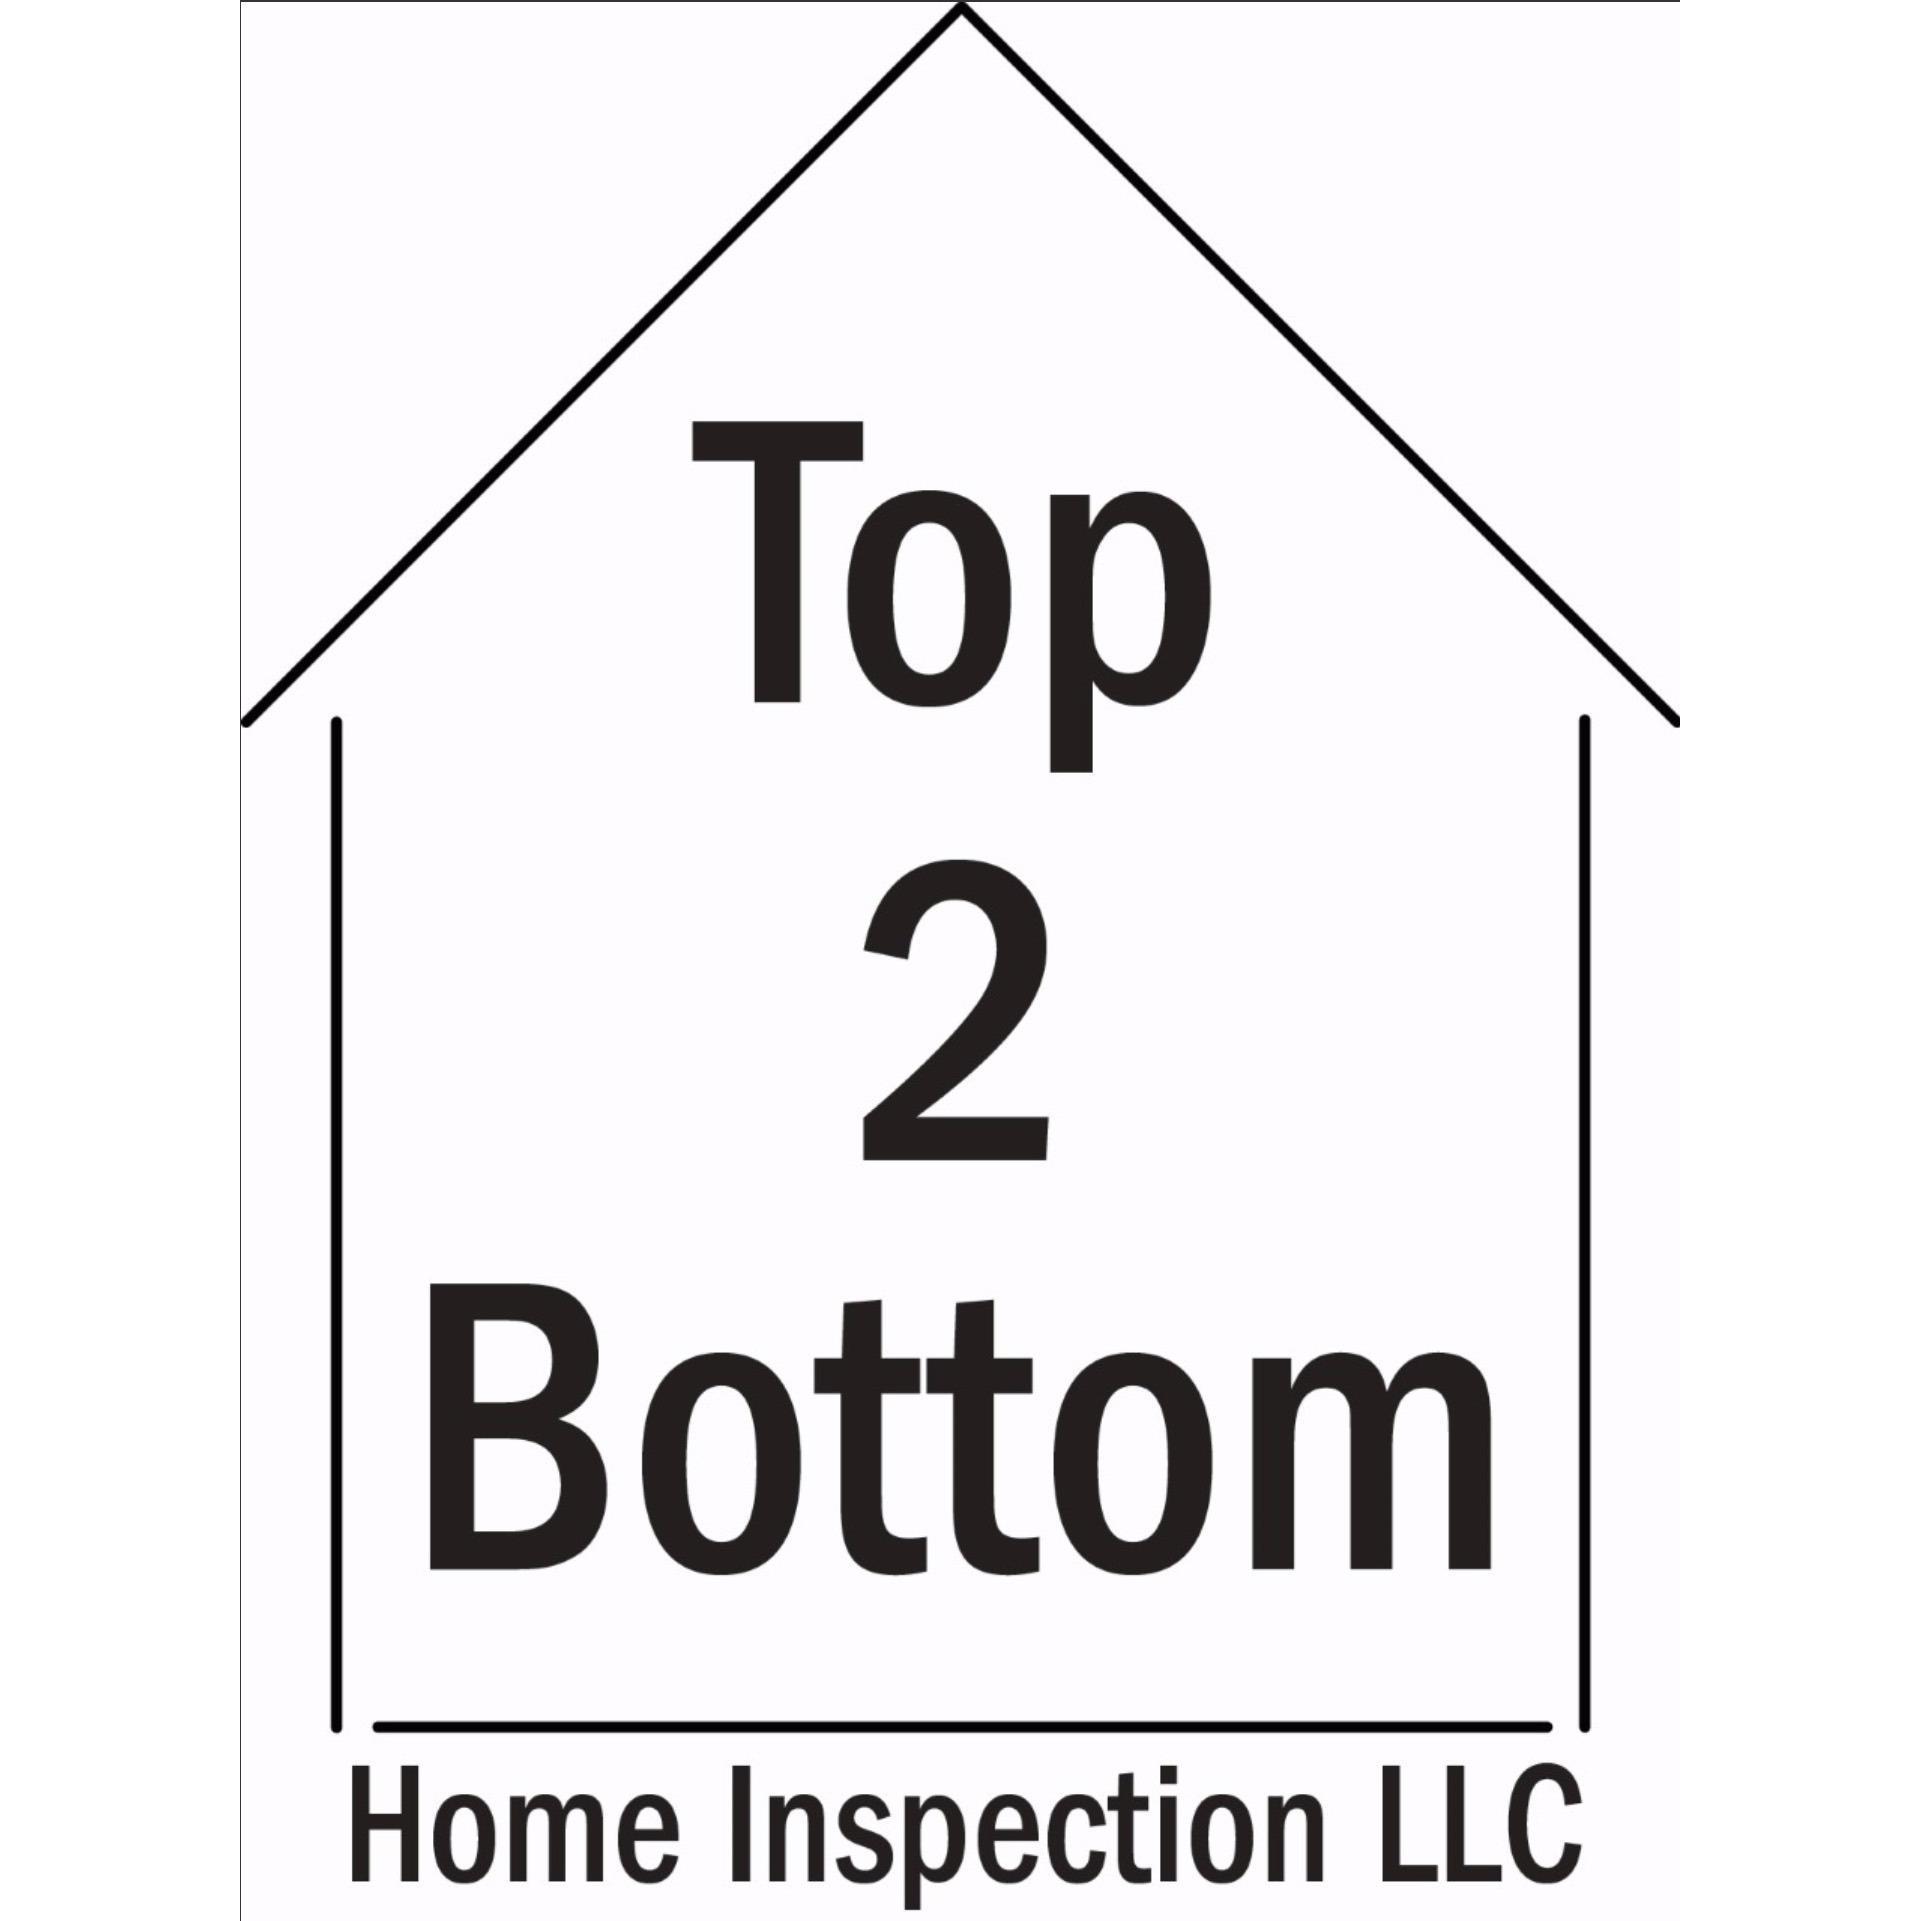 Top2Bottom Home Inspection LLC image 1